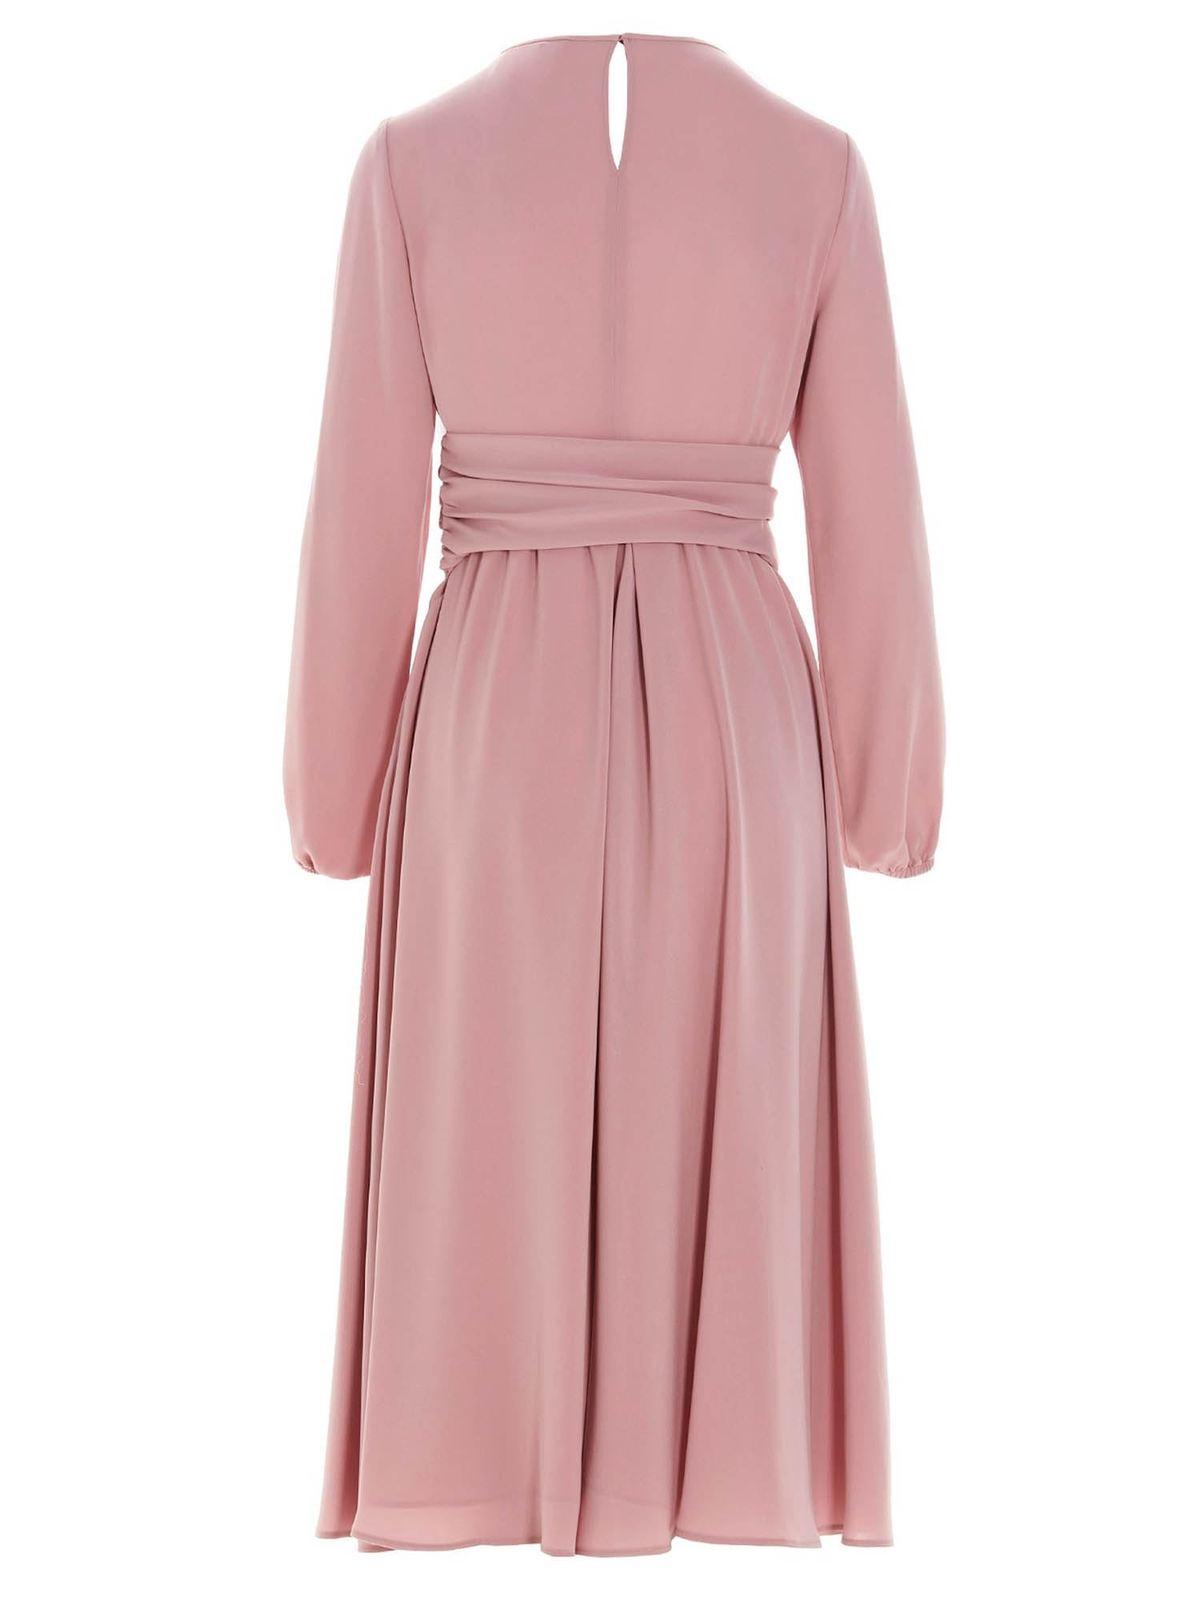 Max Mara Studio Knielanges Kleid Rosa Knielange Kleider 62211217000023